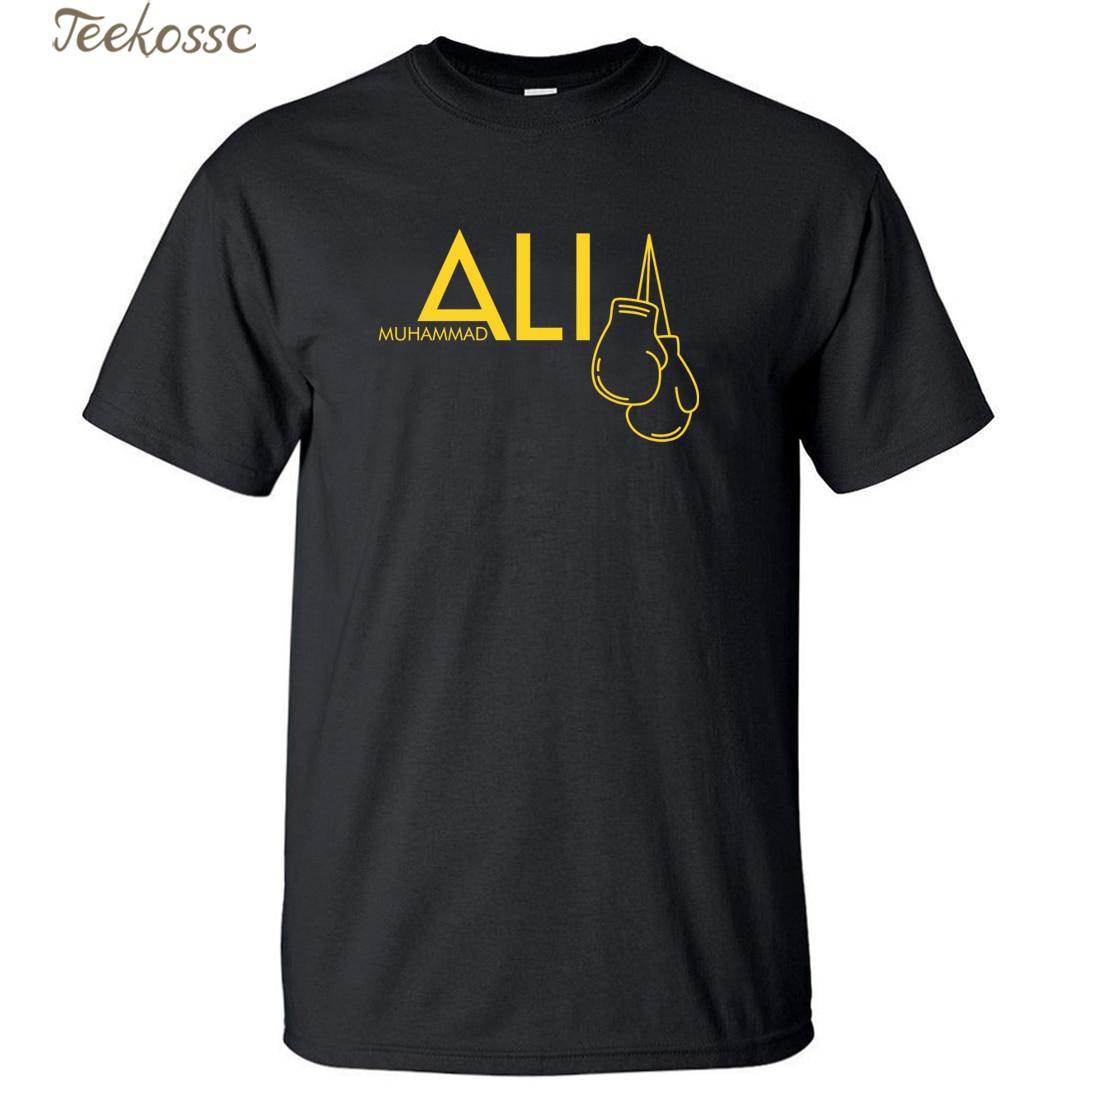 MUHAMMAD ALI Men's Top Tees 2018 Summer New Arrival Men T Shirt 100% Cotton Fitness Short Sleeve Hip Hop Streetwear Male T-Shirt